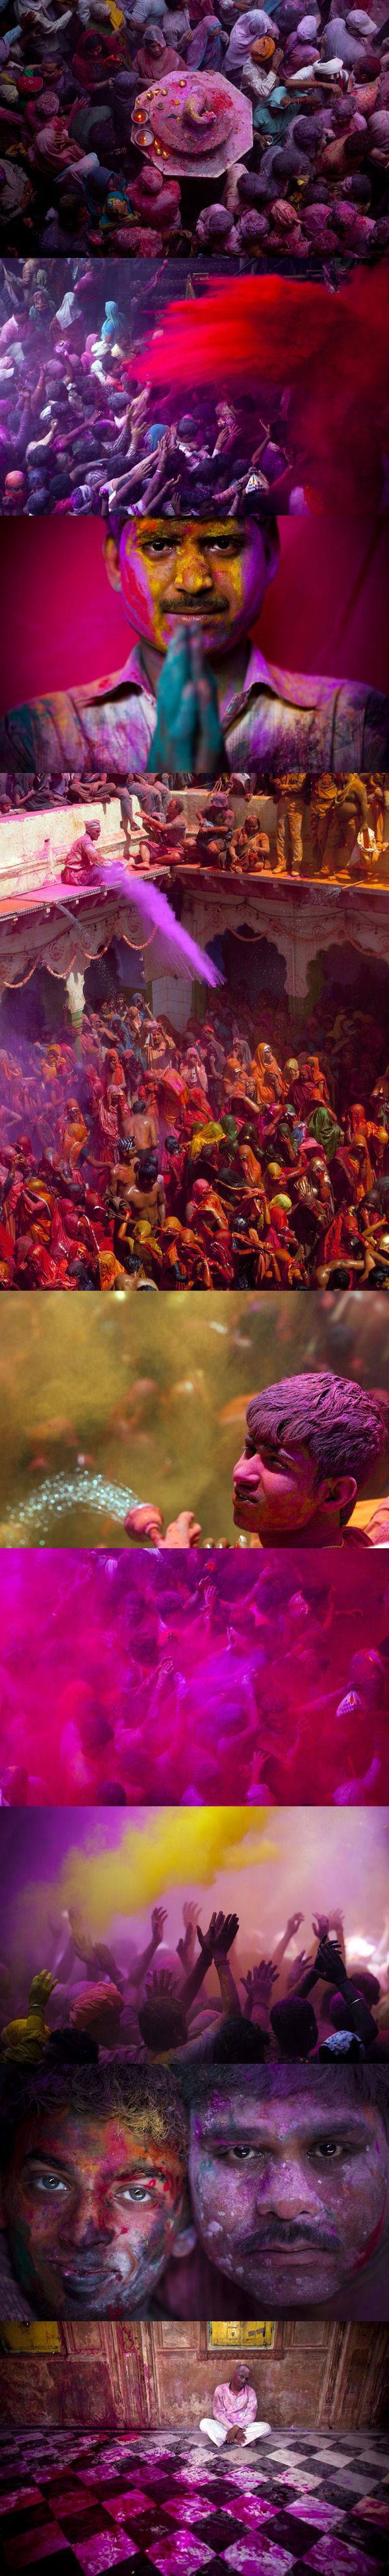 Celebration of good over evil; Holi in India